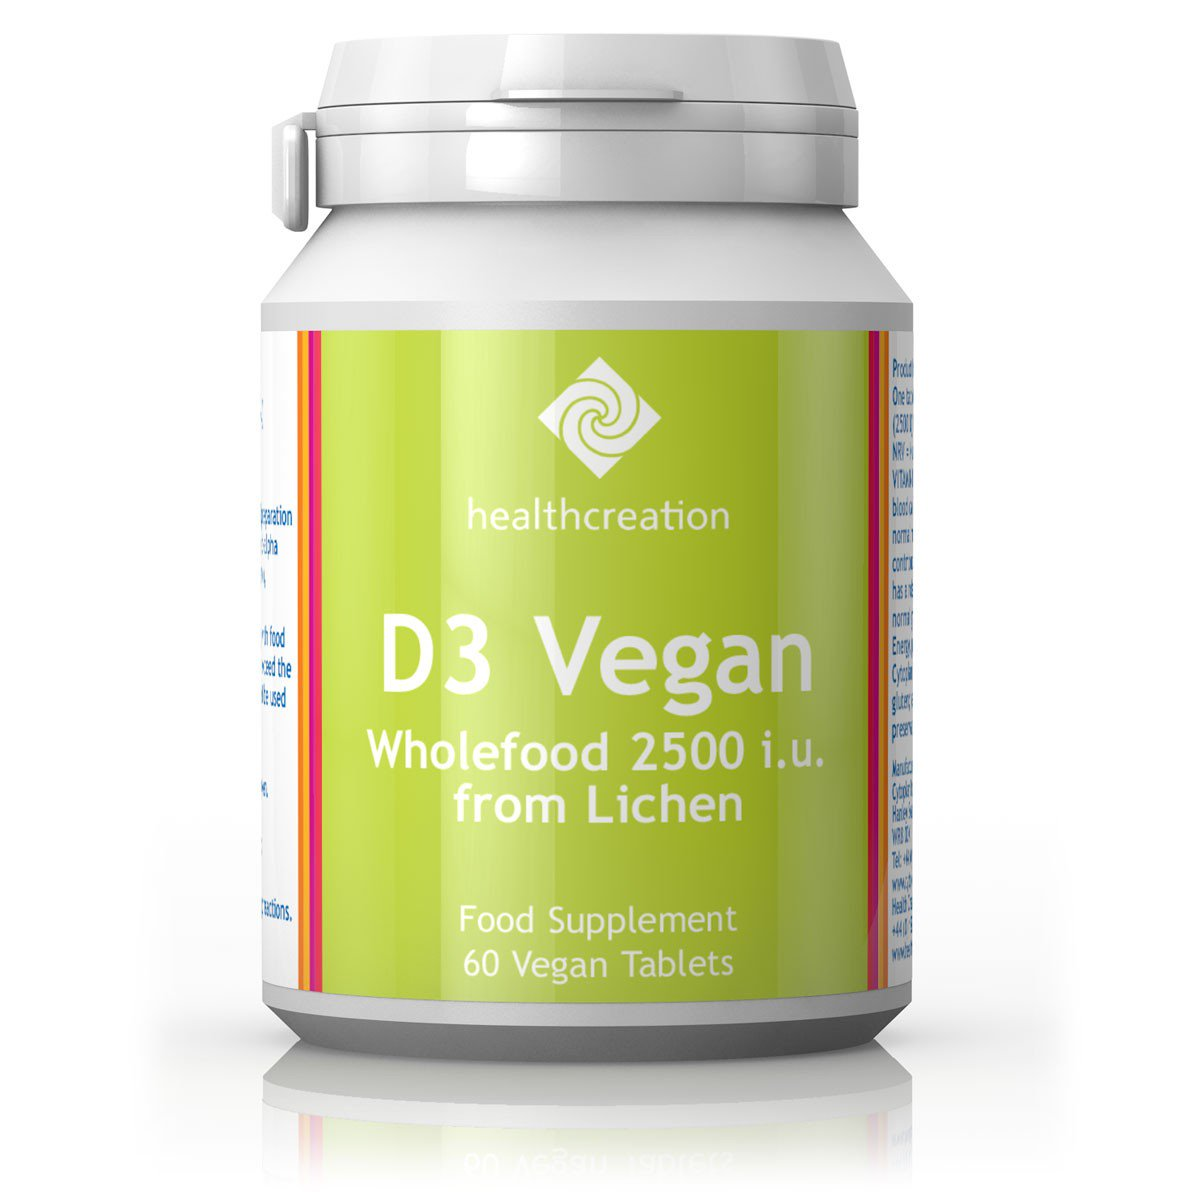 Health Creation D3 Vegan Wholefood 2500 iu from Lichen 60's